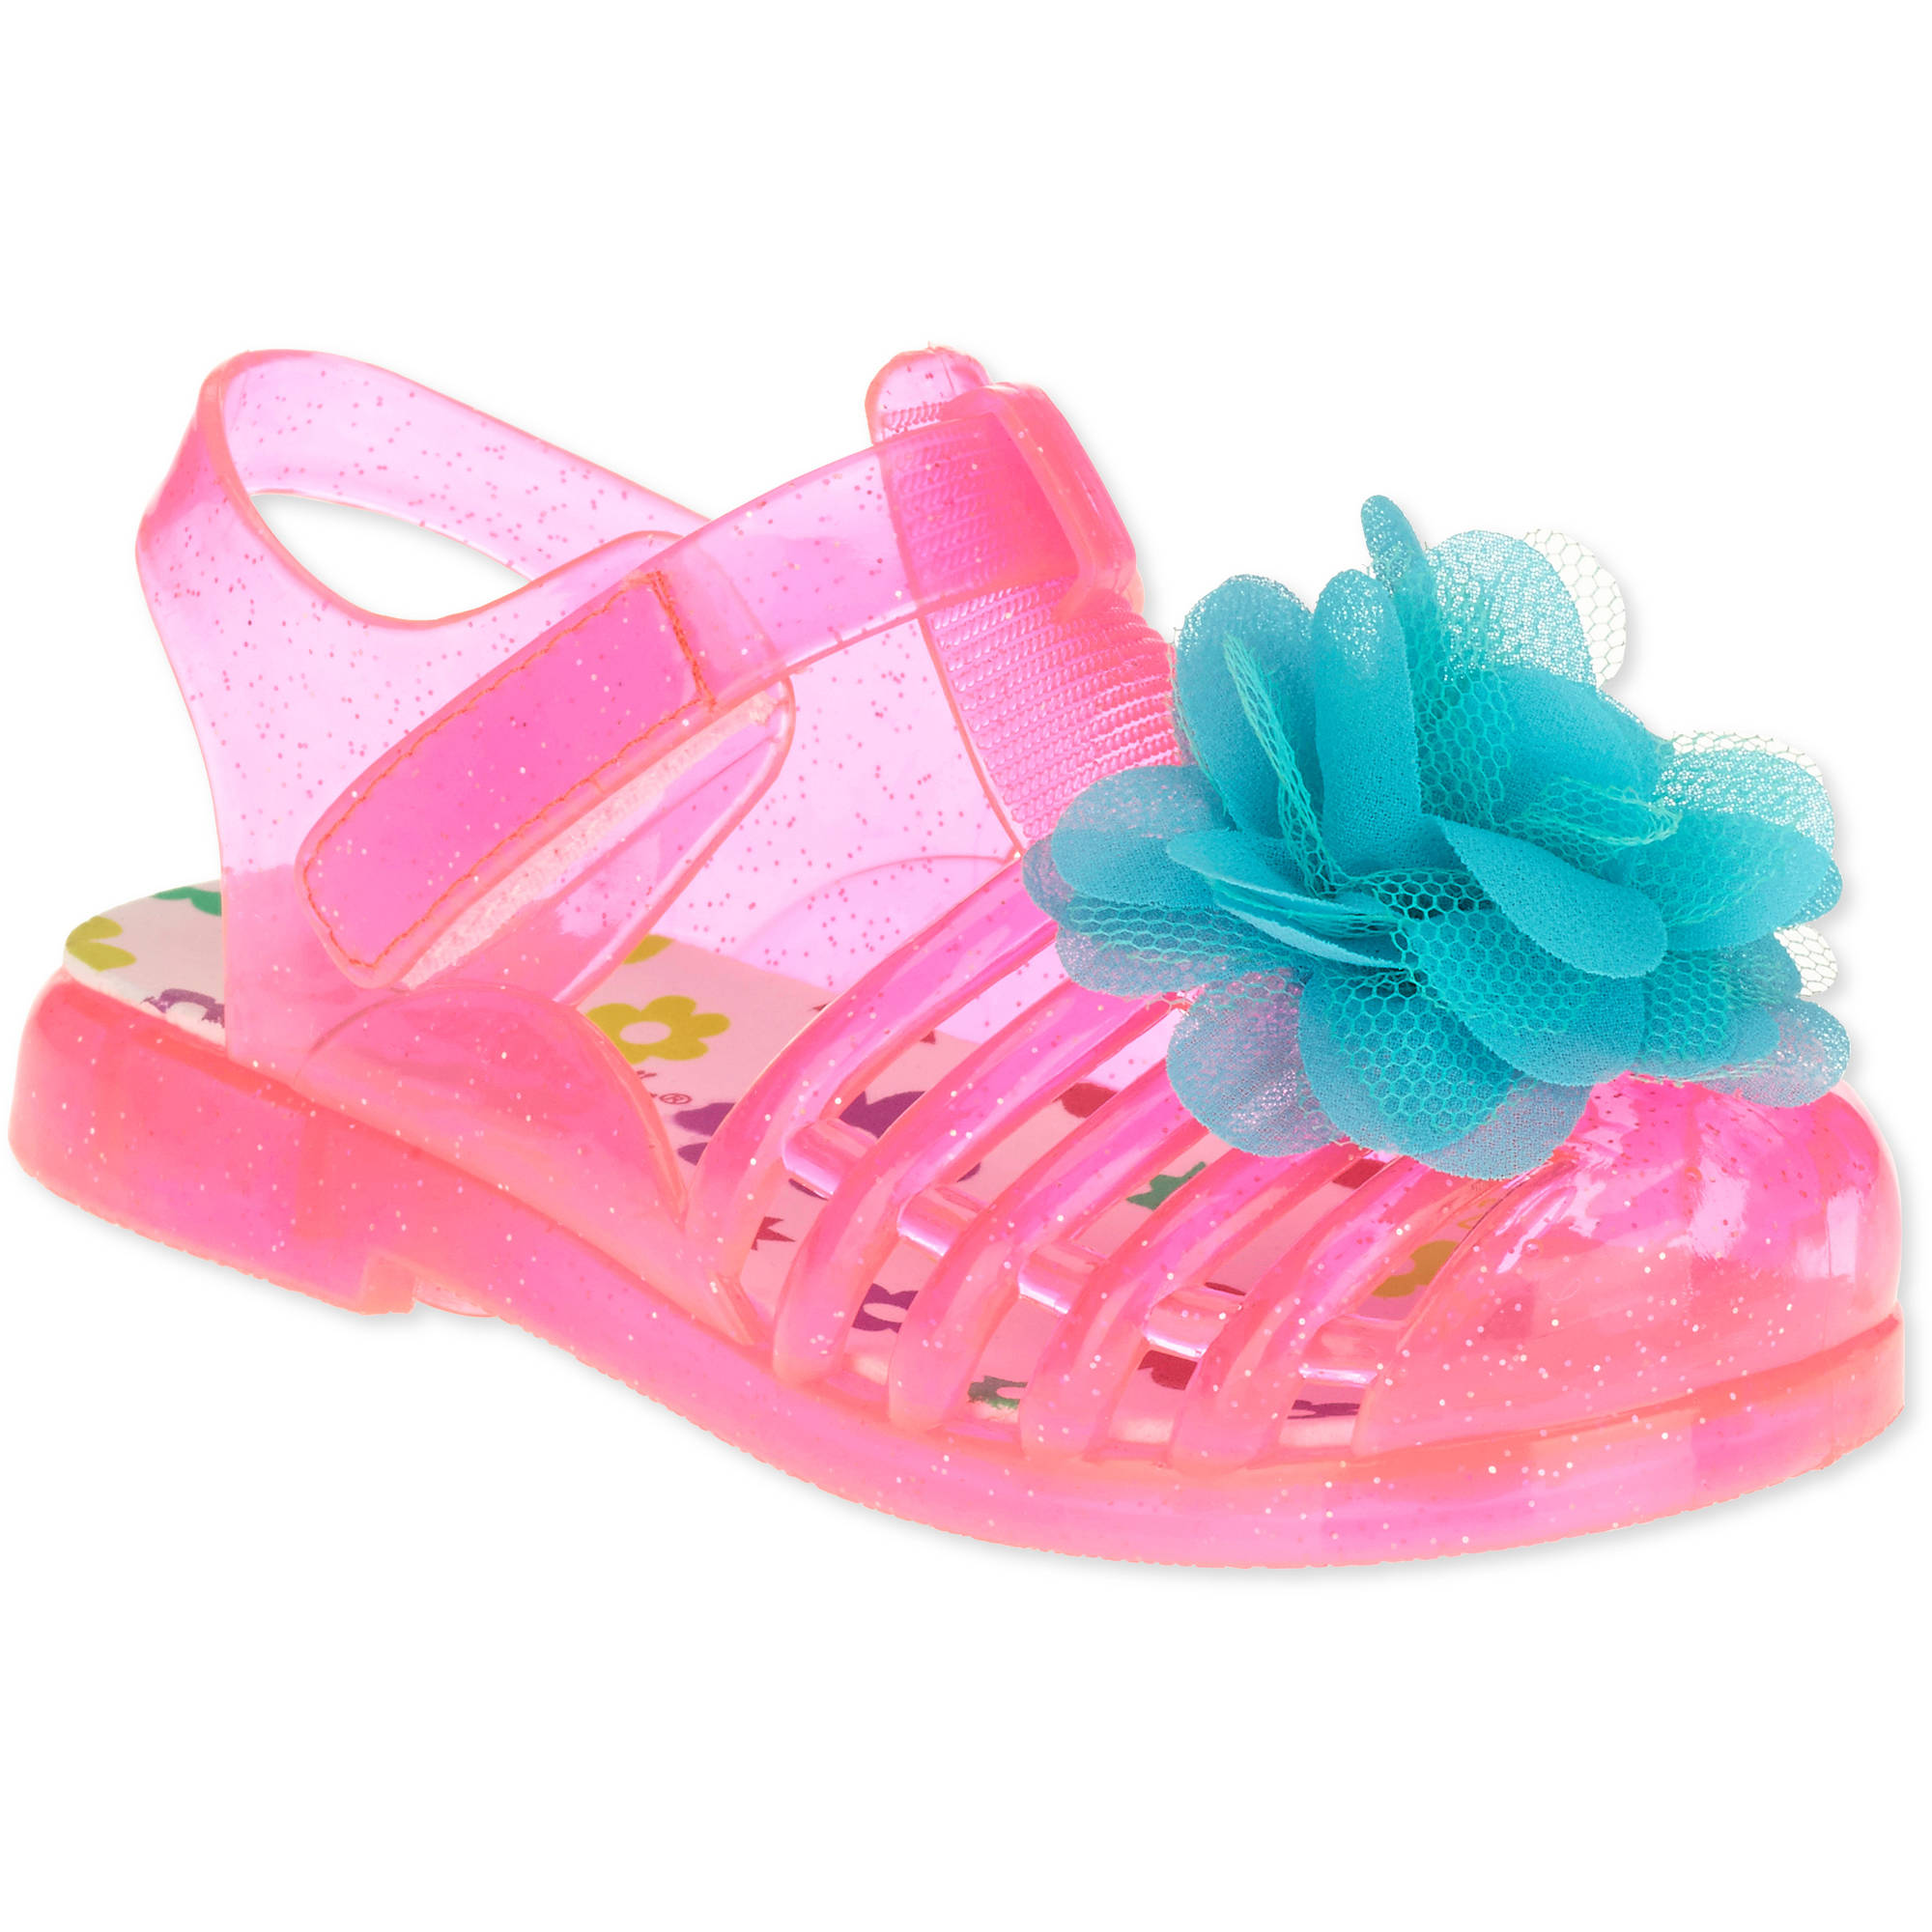 Garanimals Toddler Girls' Fish Jelly Sandal